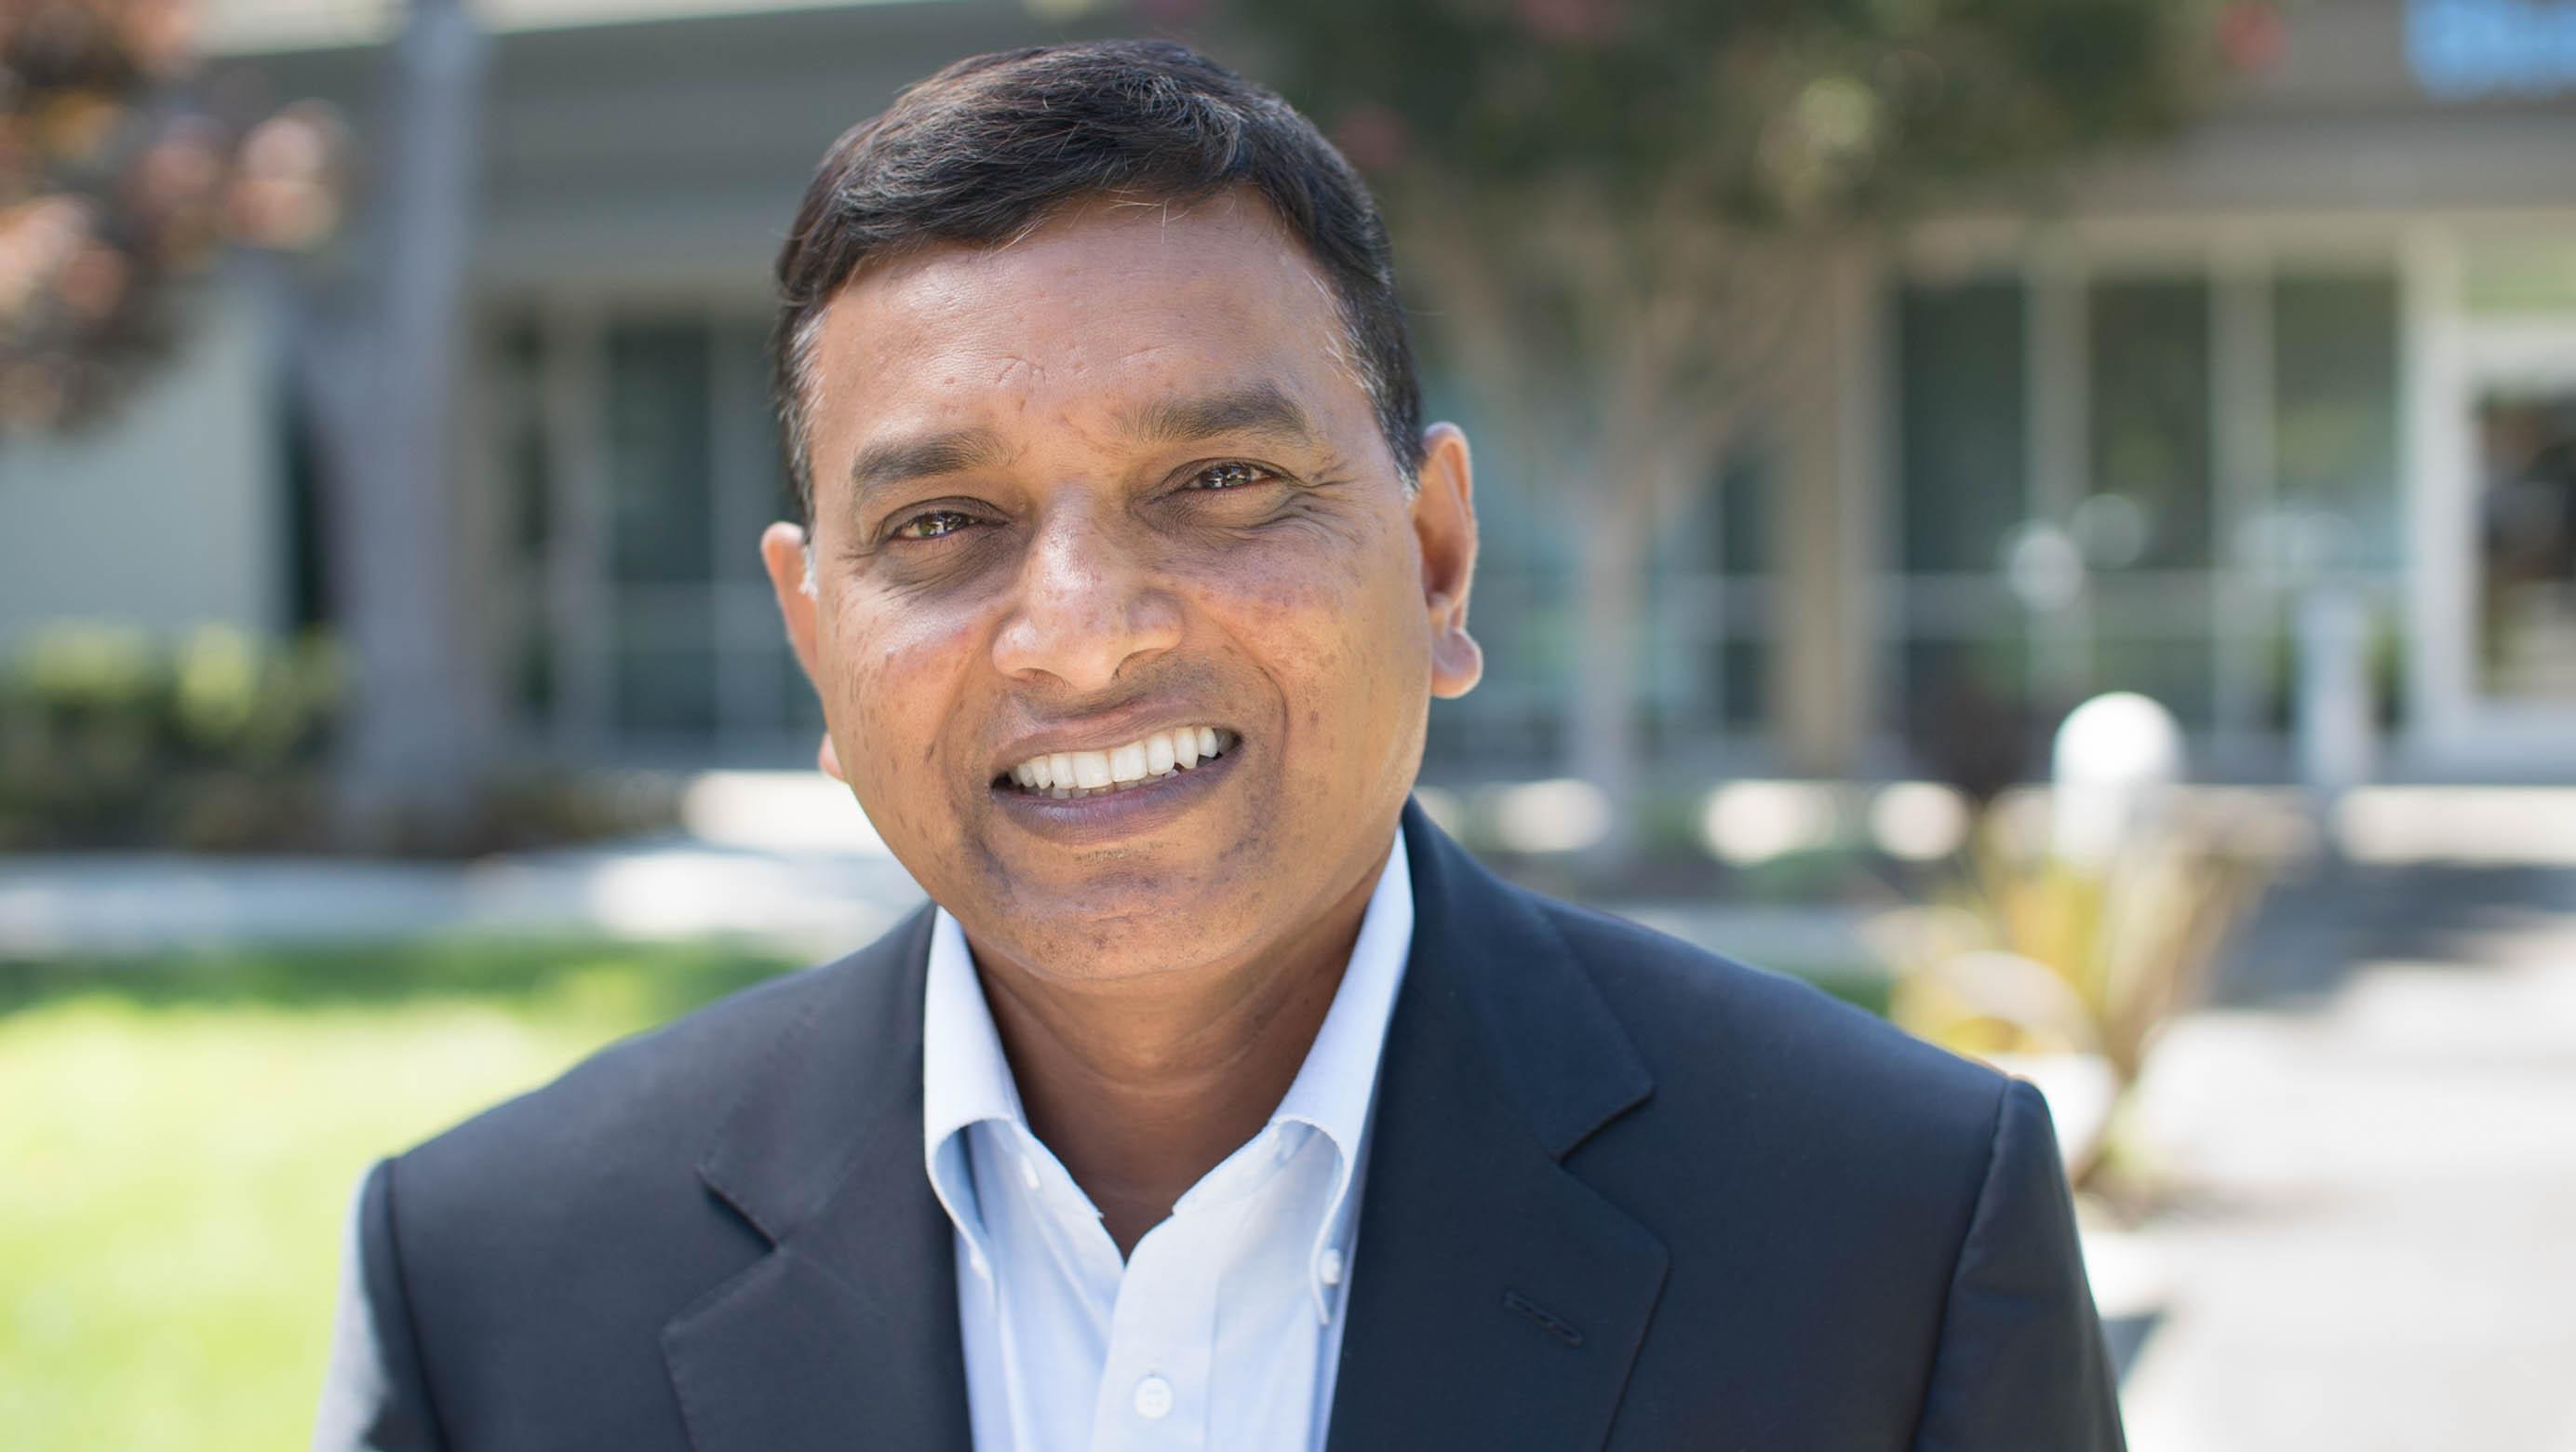 Krish Ramakrishnan, CEO of BlueJeans